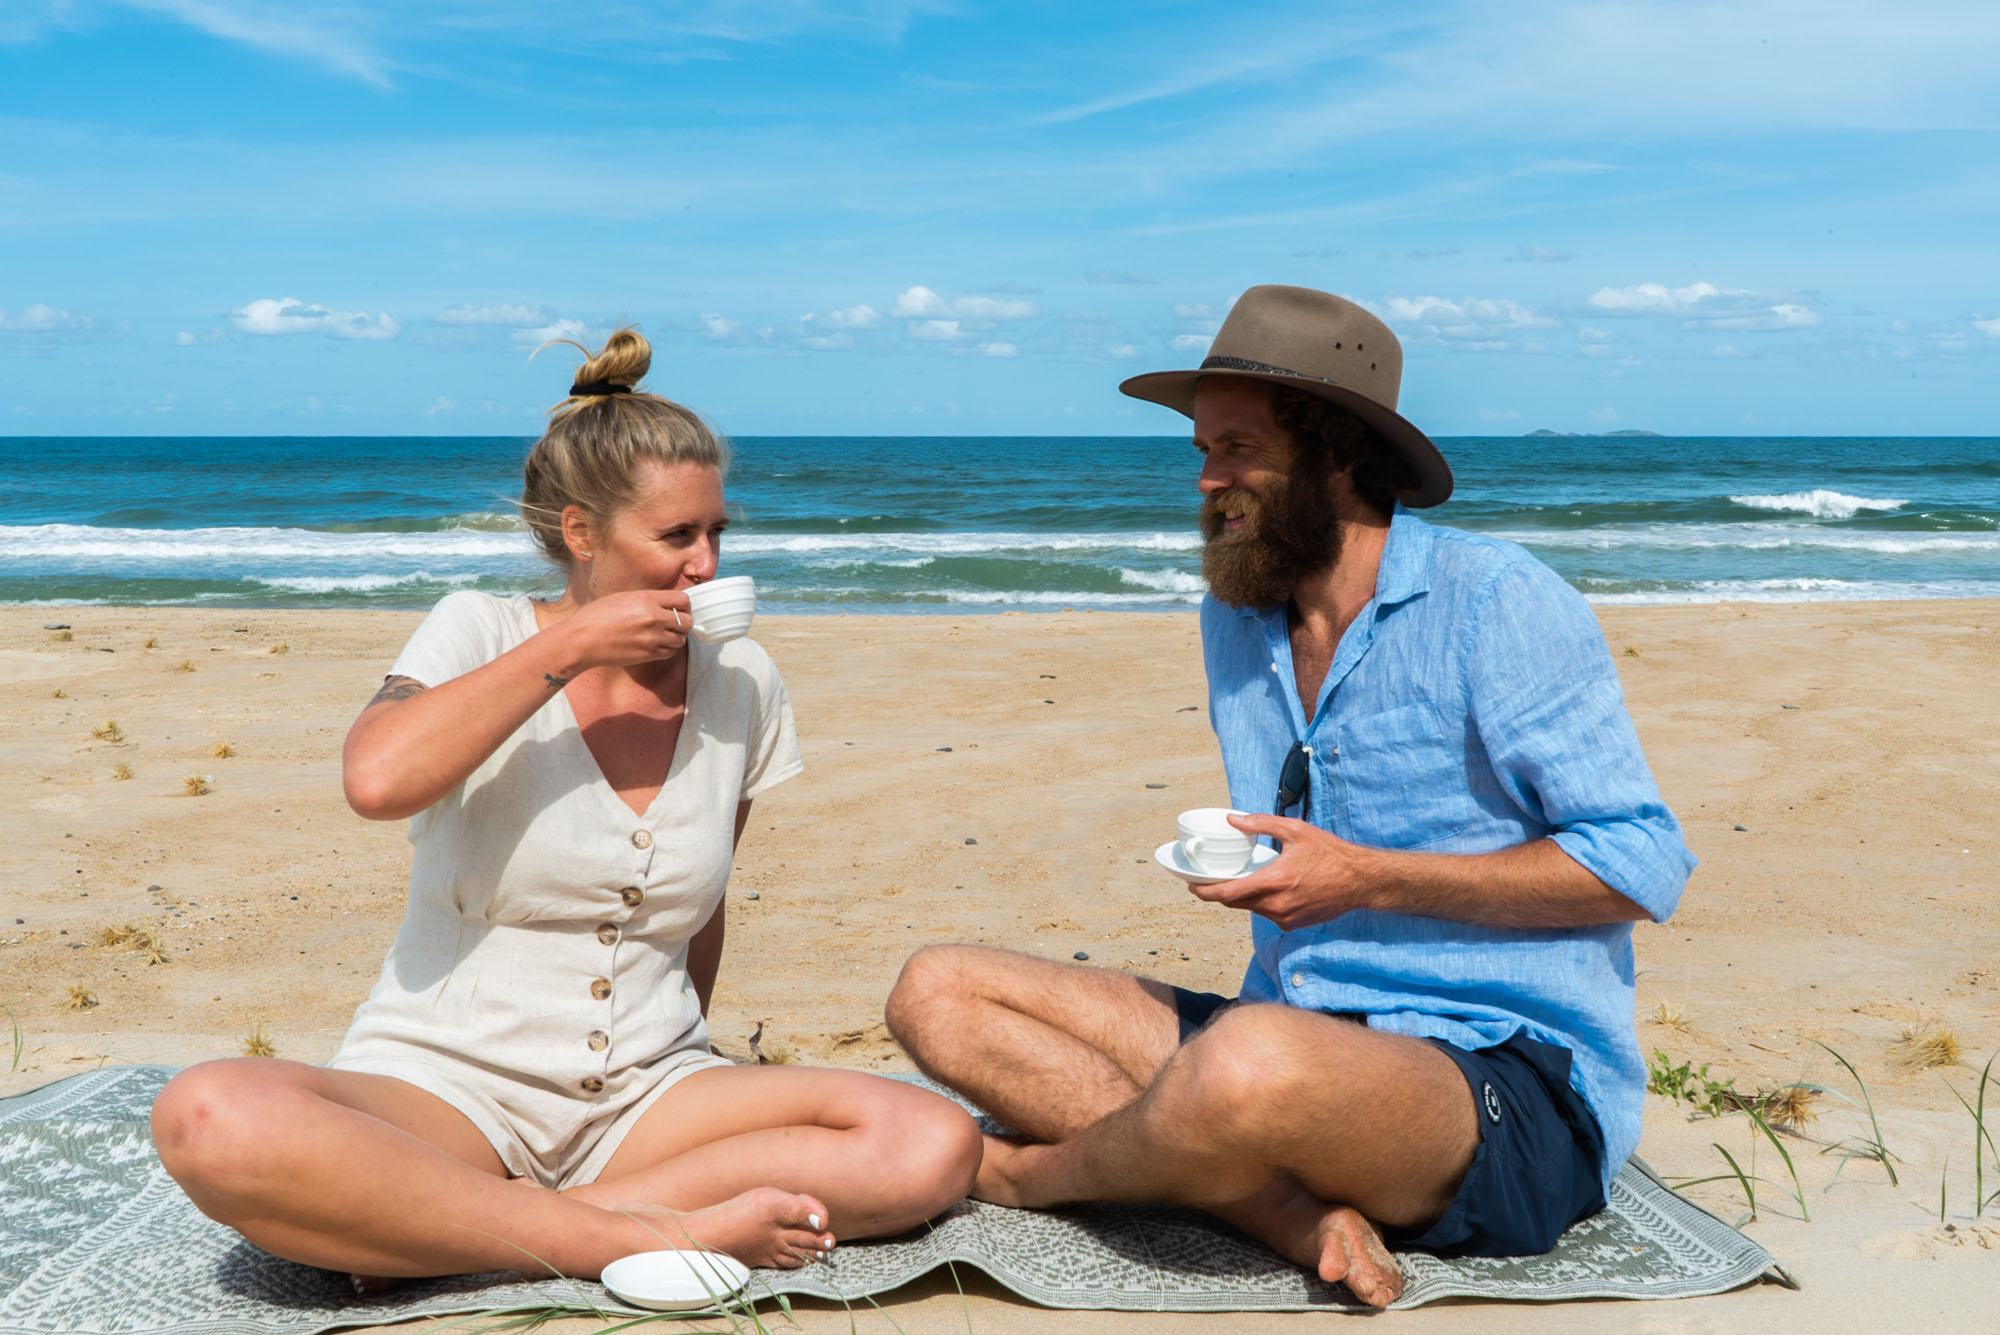 Church With No Walls - Mike and Hannah King - Mentors - Life Coaches - Meditation - Australia-5.jpg